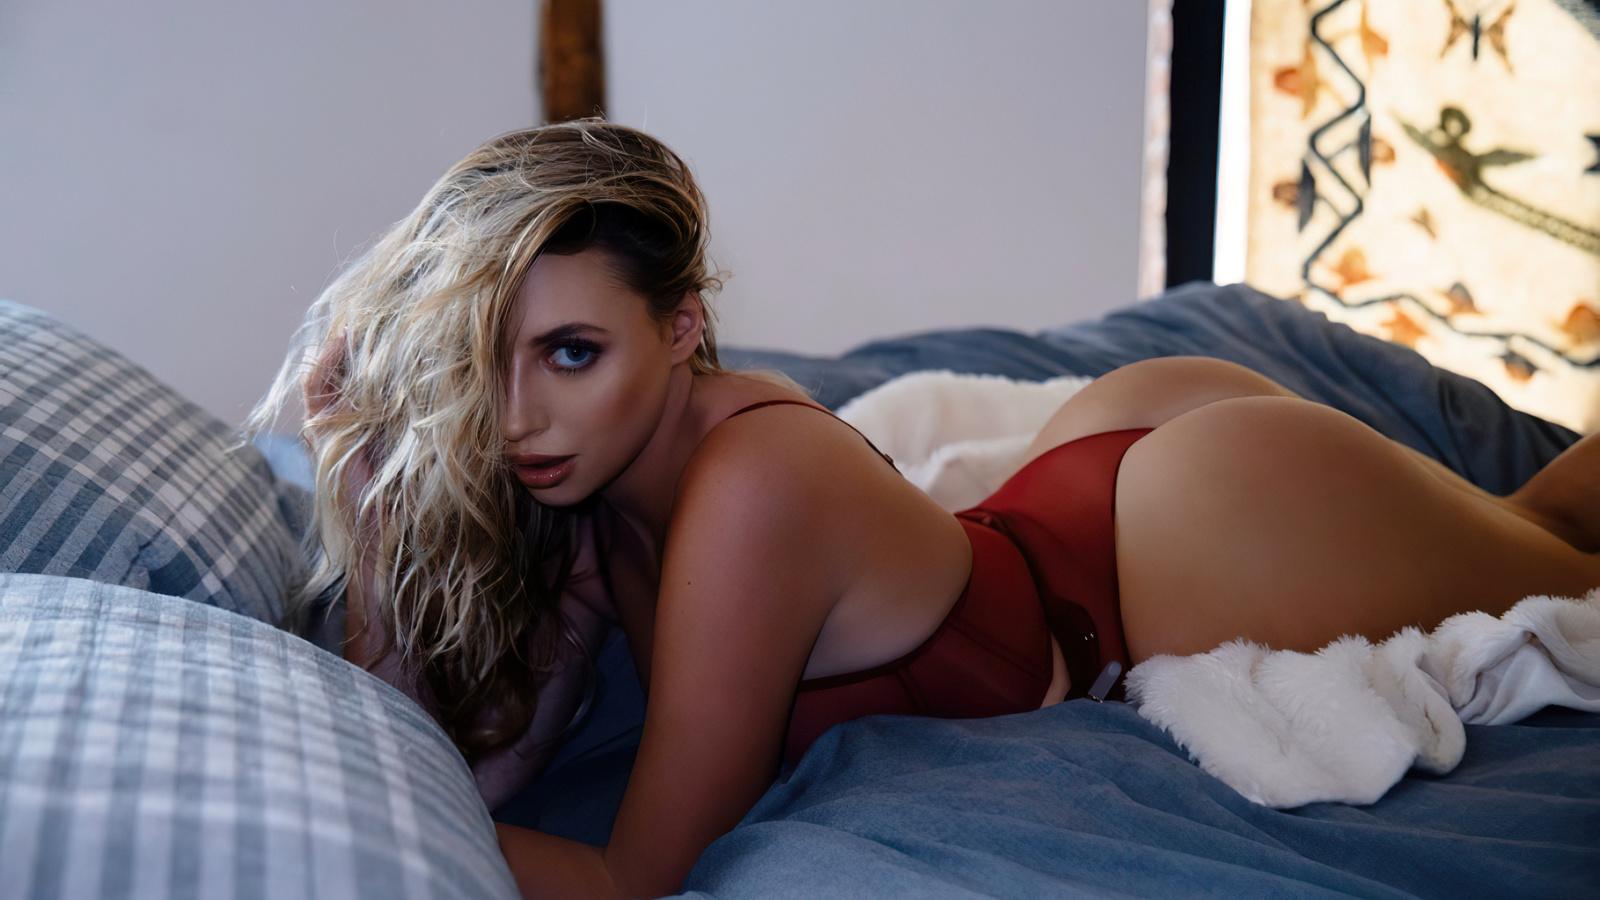 blonde, sexy, model, cute, hot, pretty, bed, panties, window, bra, lingerie, ass, perfect